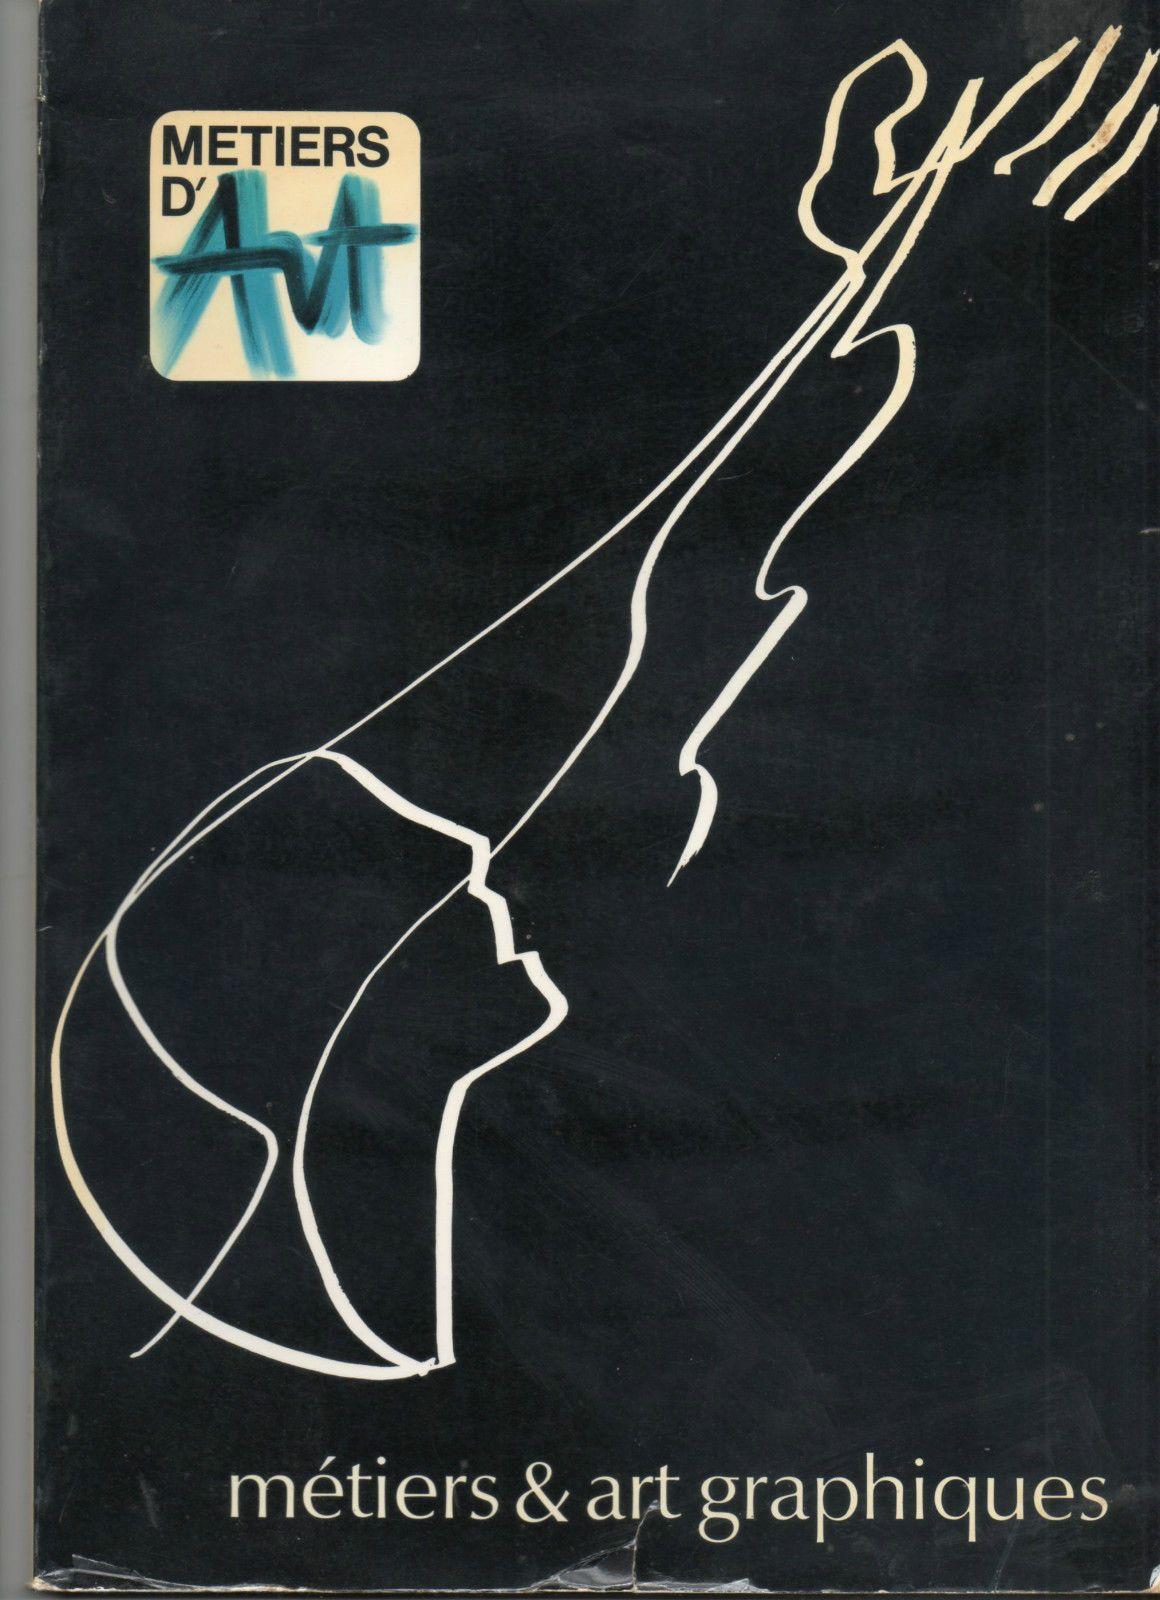 revue Métiers d'Art,n°7, 1979, graphisme, graphiste, Raymond Gid